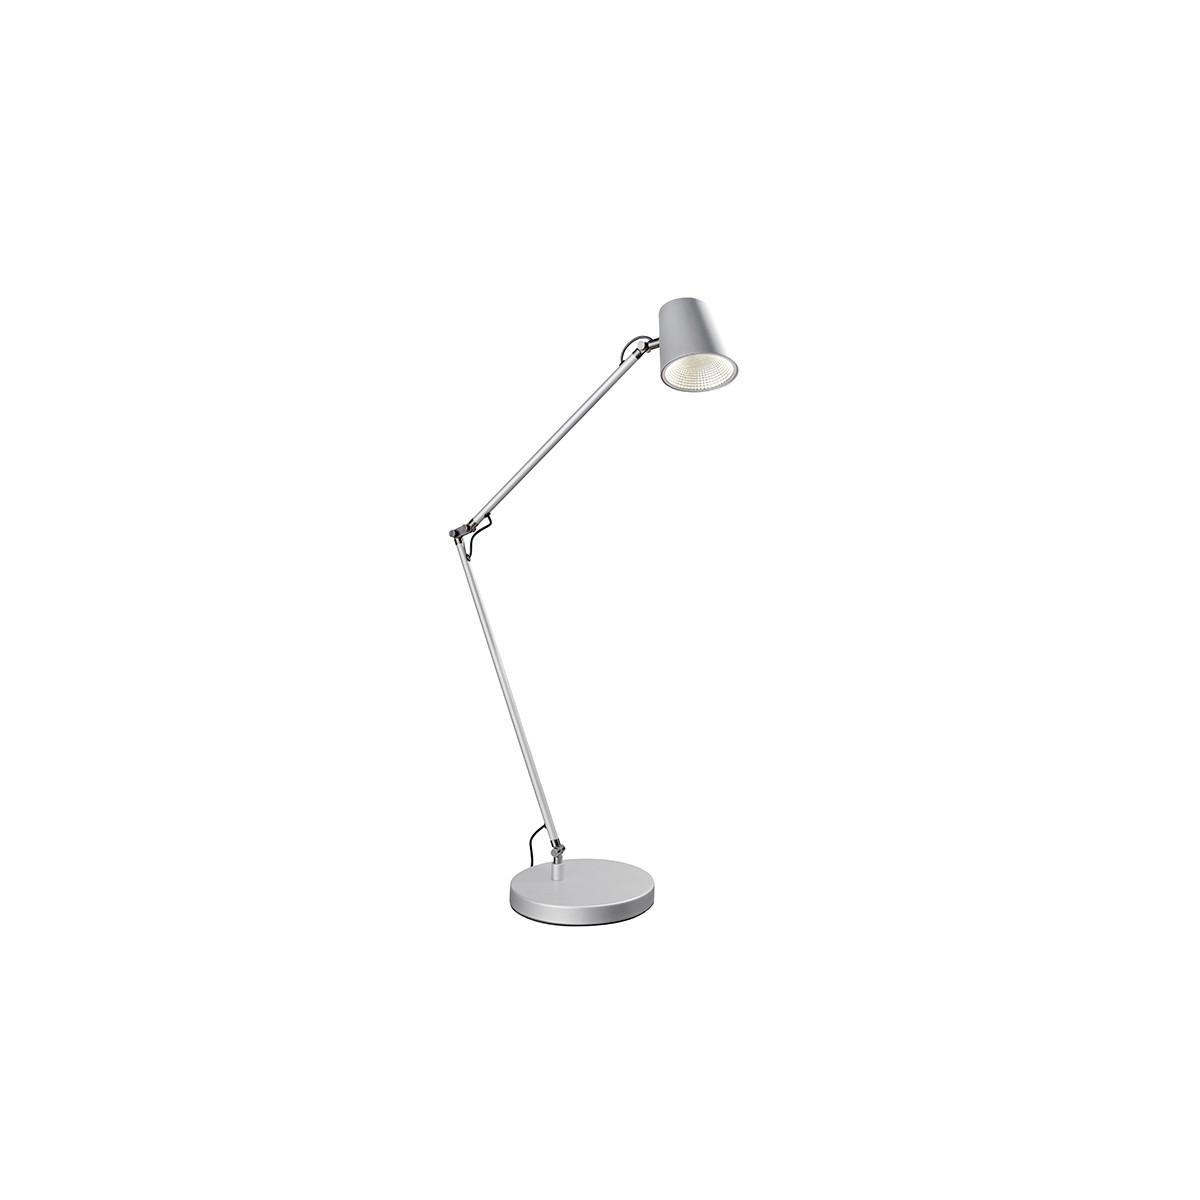 Sompex Tingle LED Tischleuchte, silberfarben